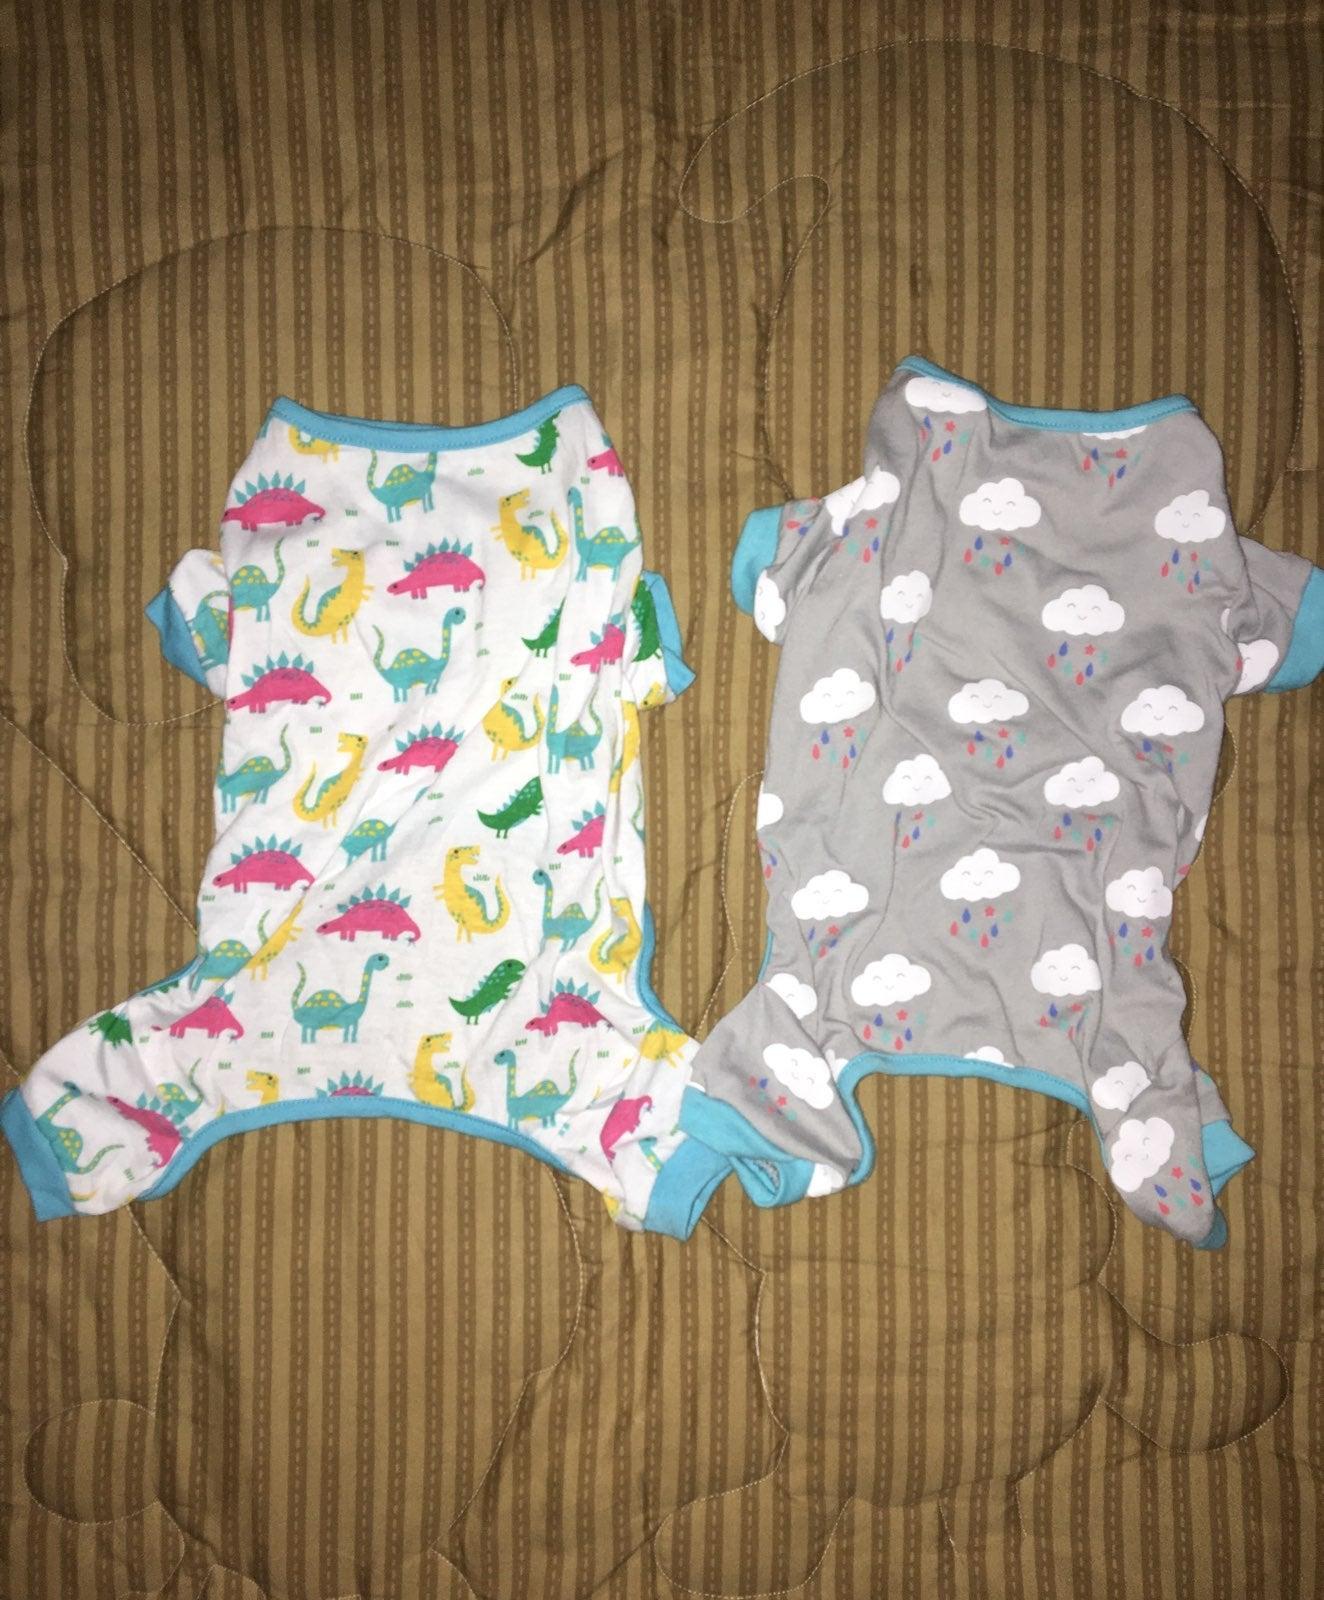 TWO Frisco Small Dog/Cat Pajamas